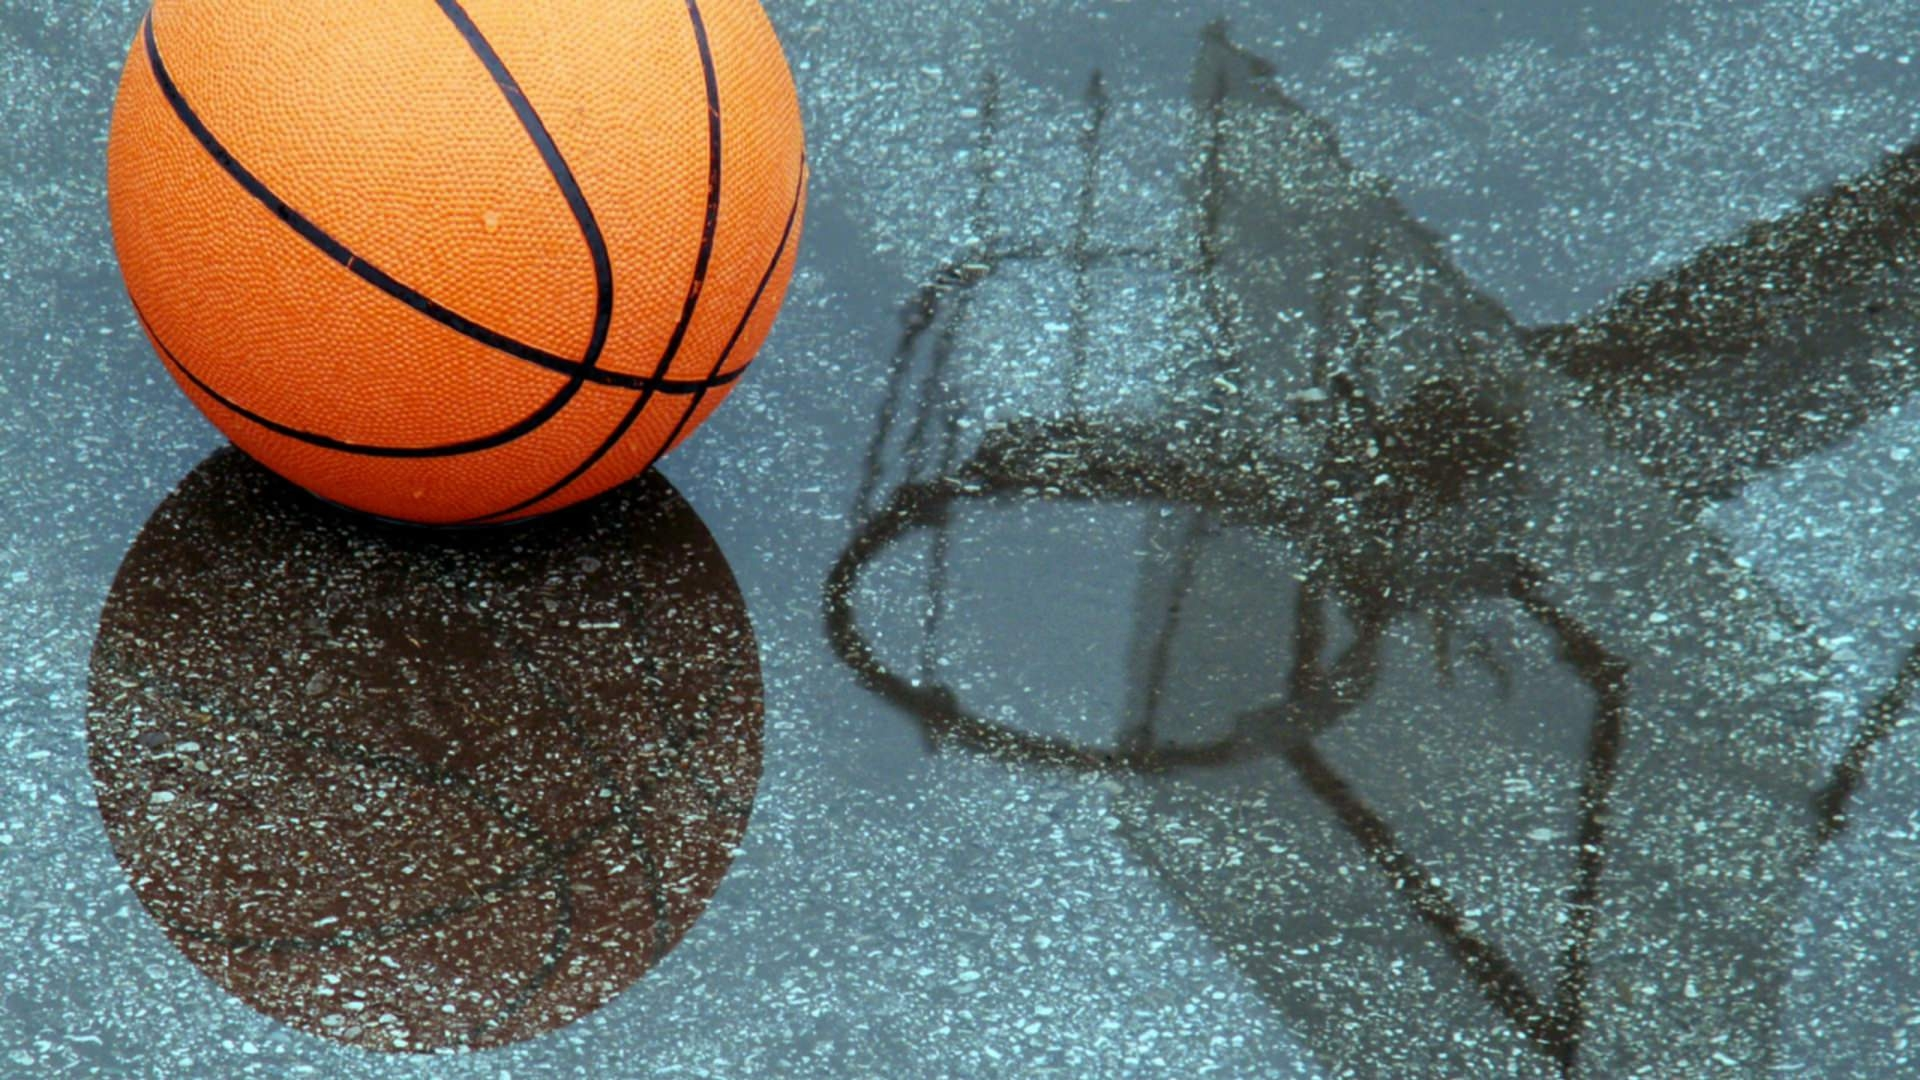 Pool Reflection Basketball Wallpaper